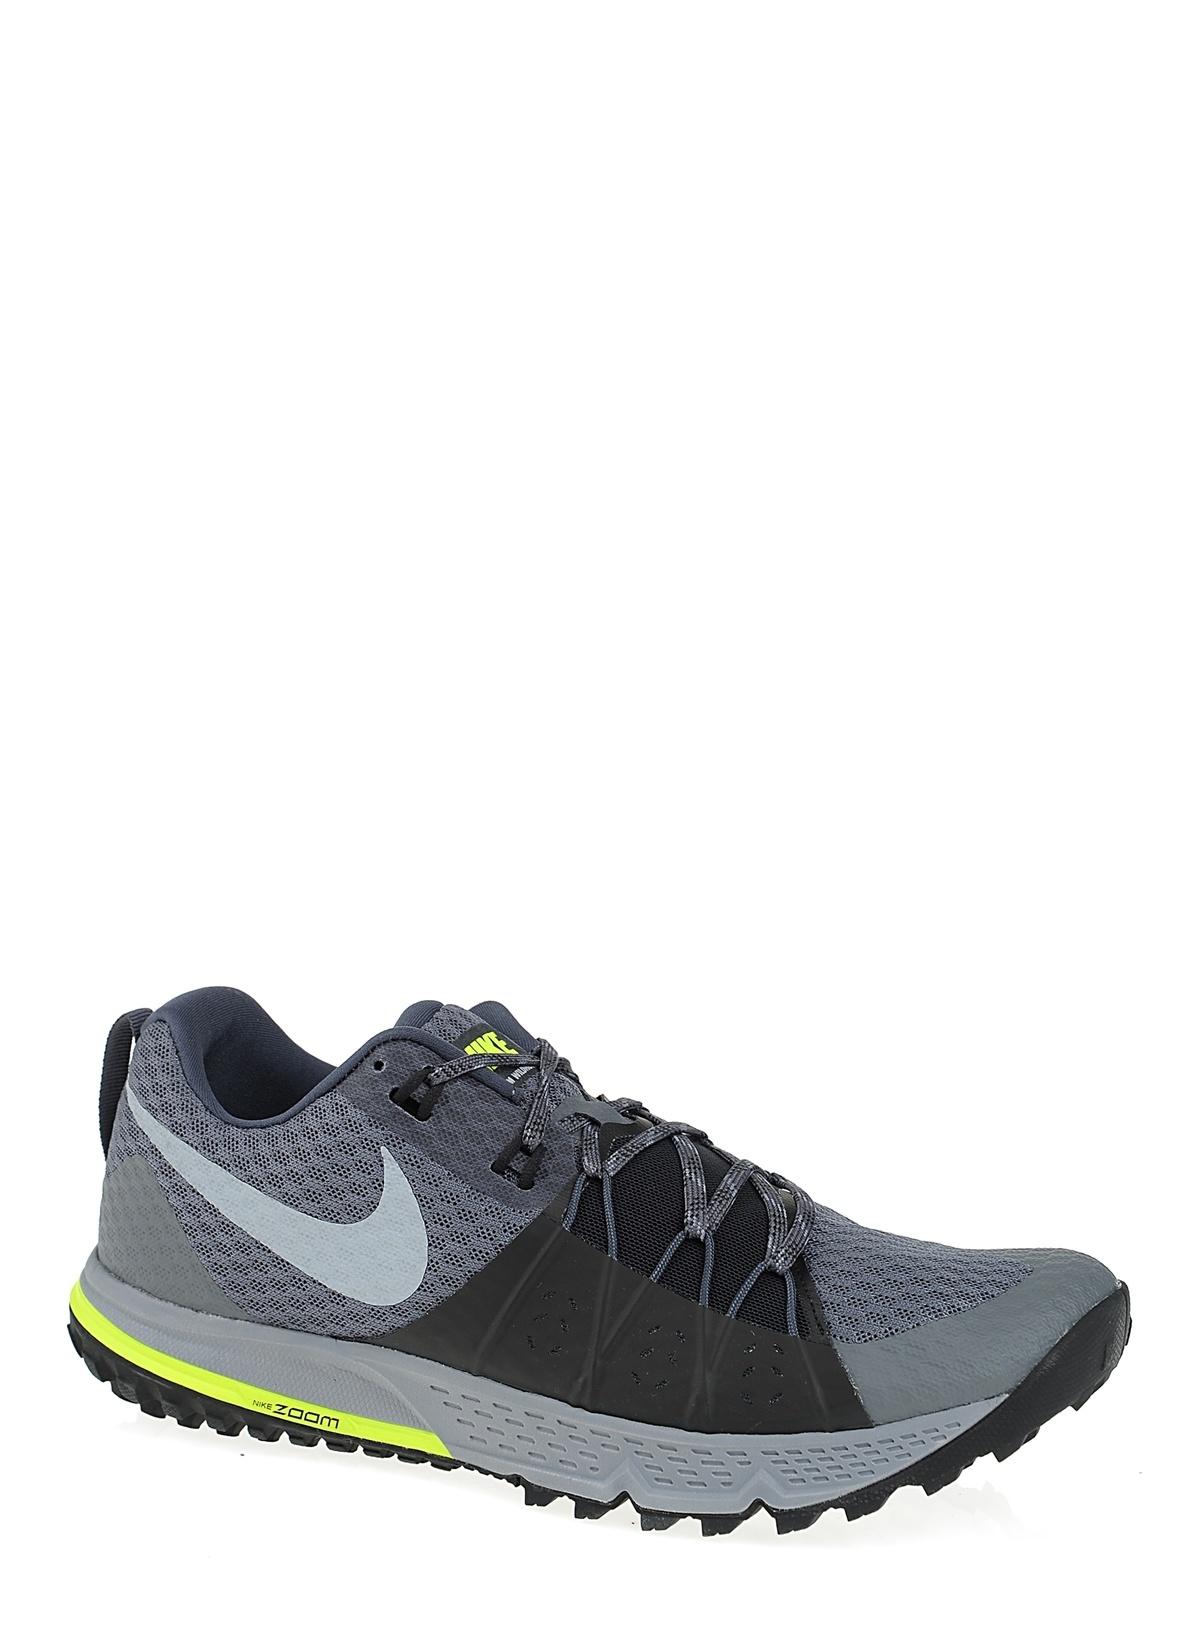 buy online 3b18a f5094 880565-001-Nike-Air-Zoom-Wildhorse-4